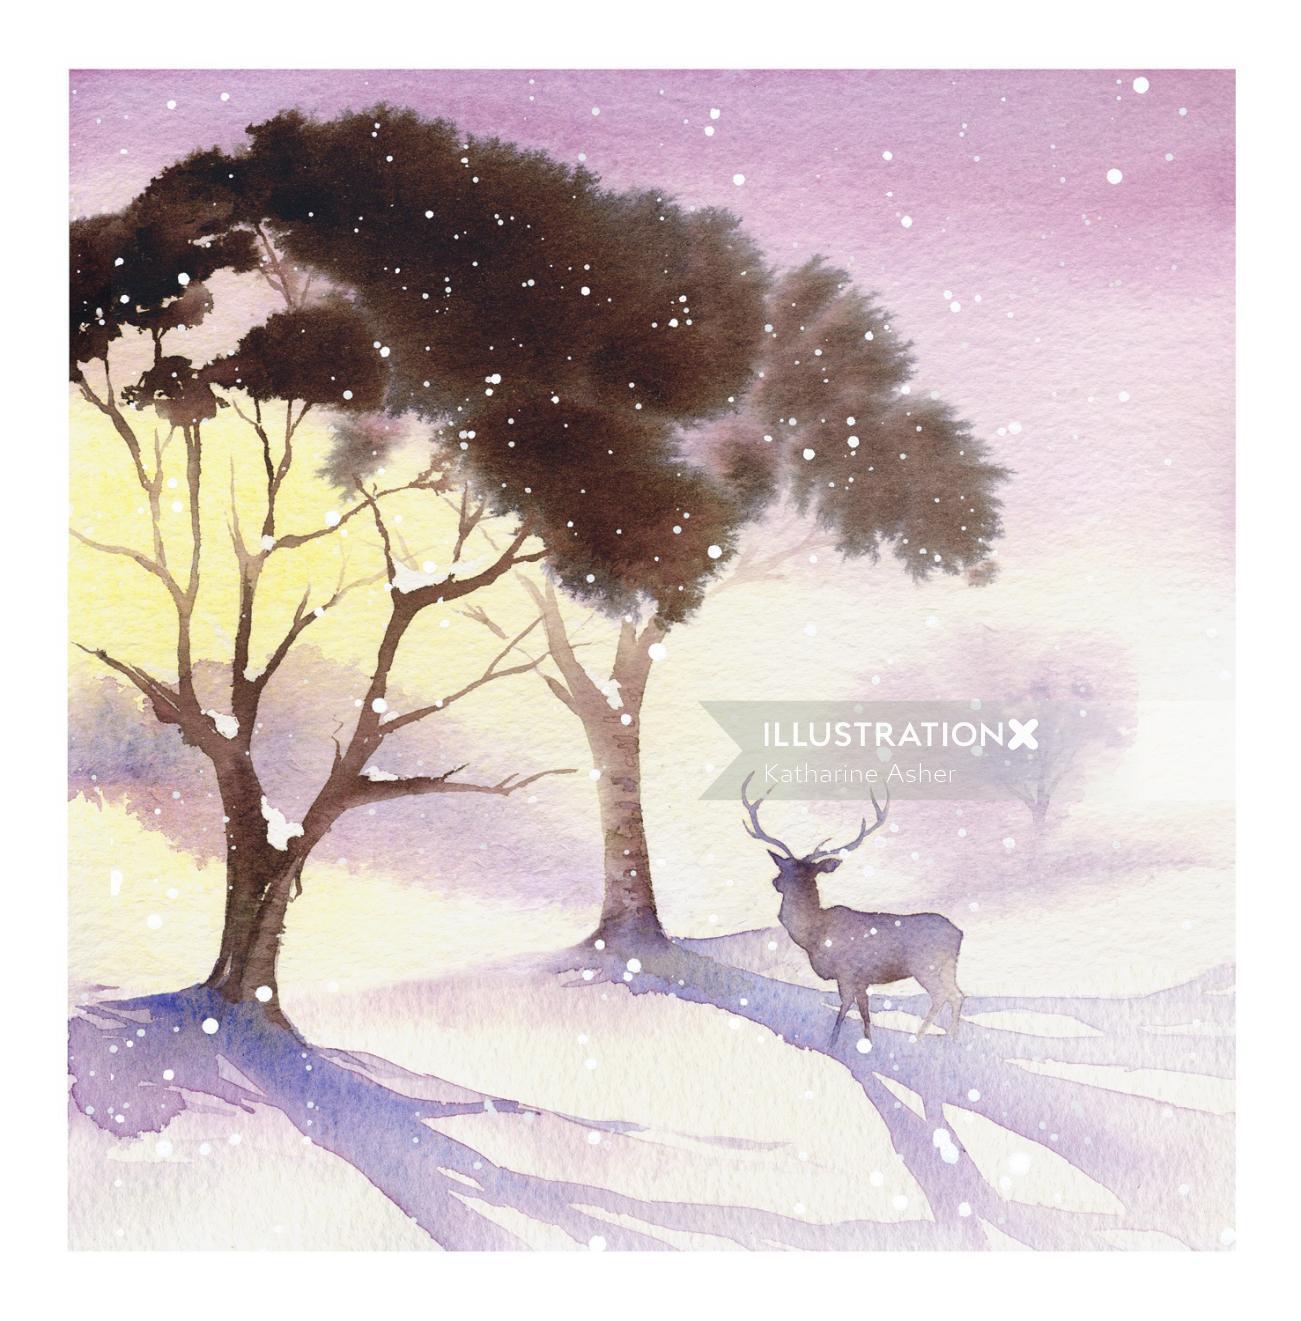 festive card illustration of deer by Katharine Asher